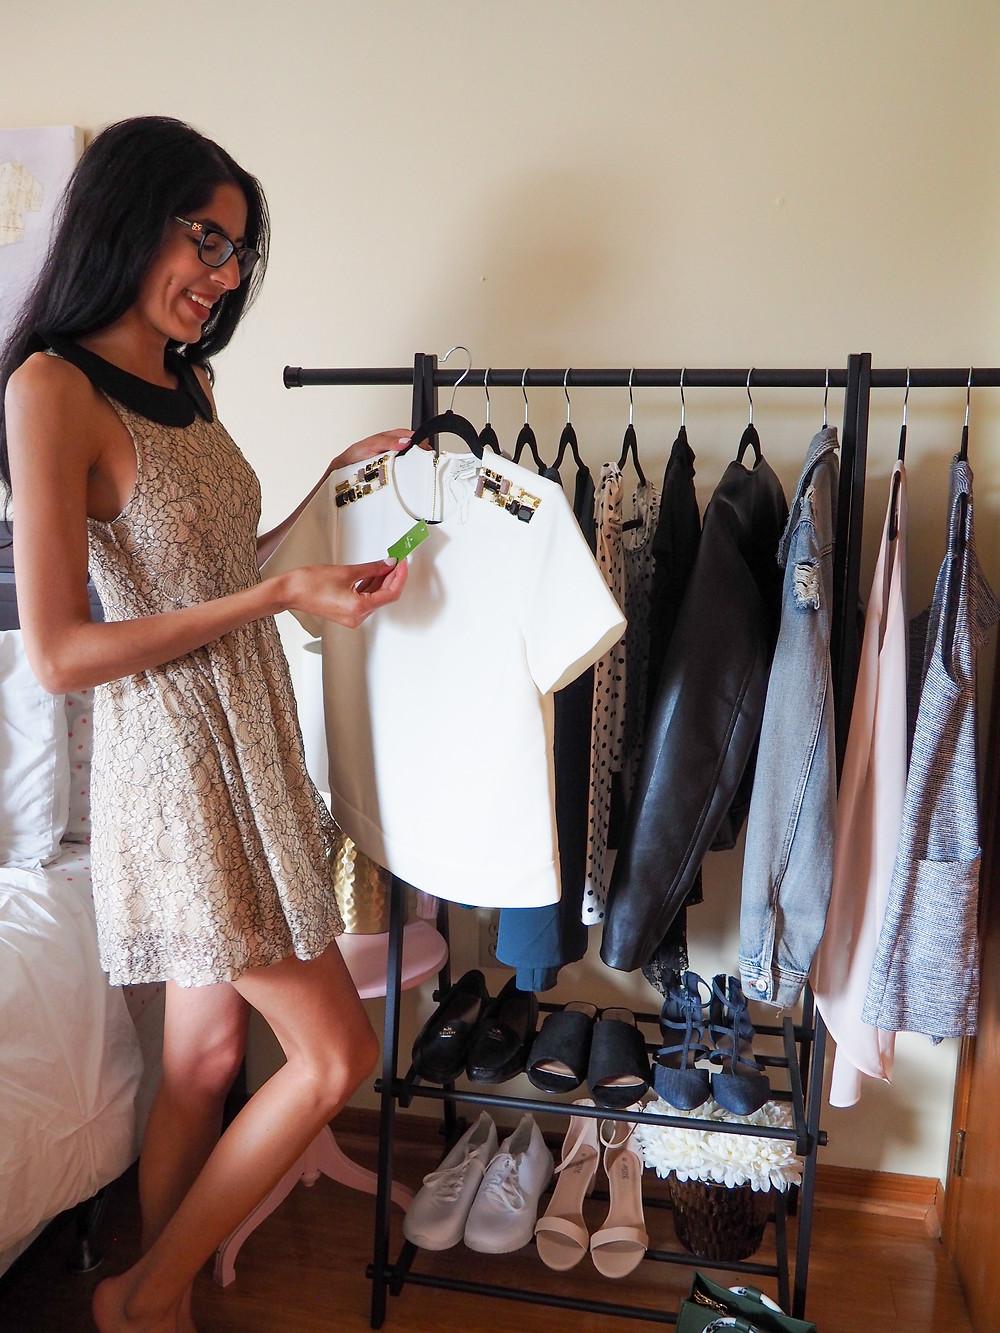 woman shopping in her closet